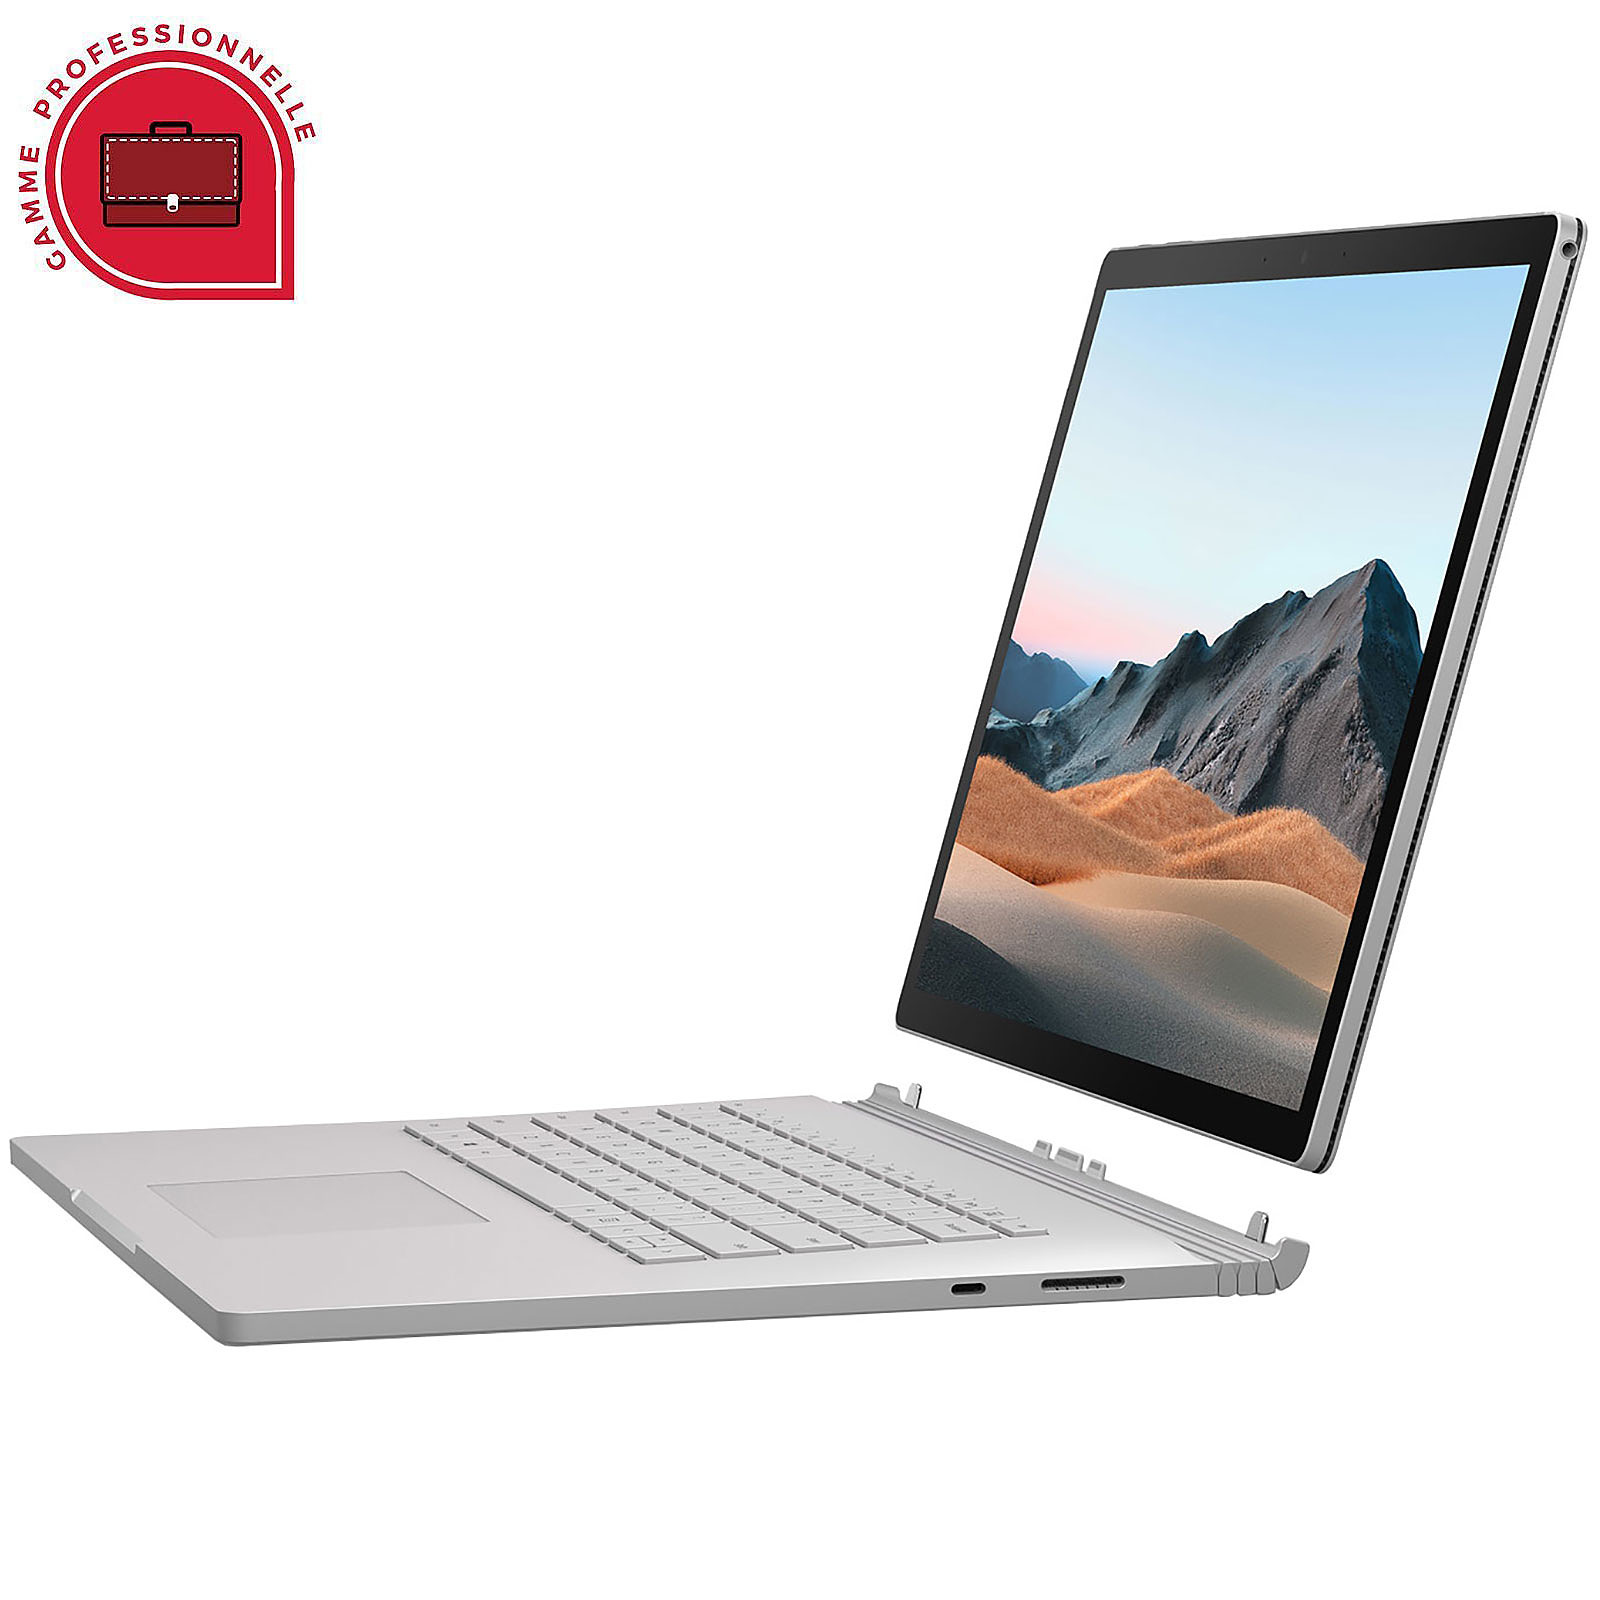 "Microsoft Surface Book 3 13.5"" for Business - i7-1065G7 - 32 Go - 512 Go"